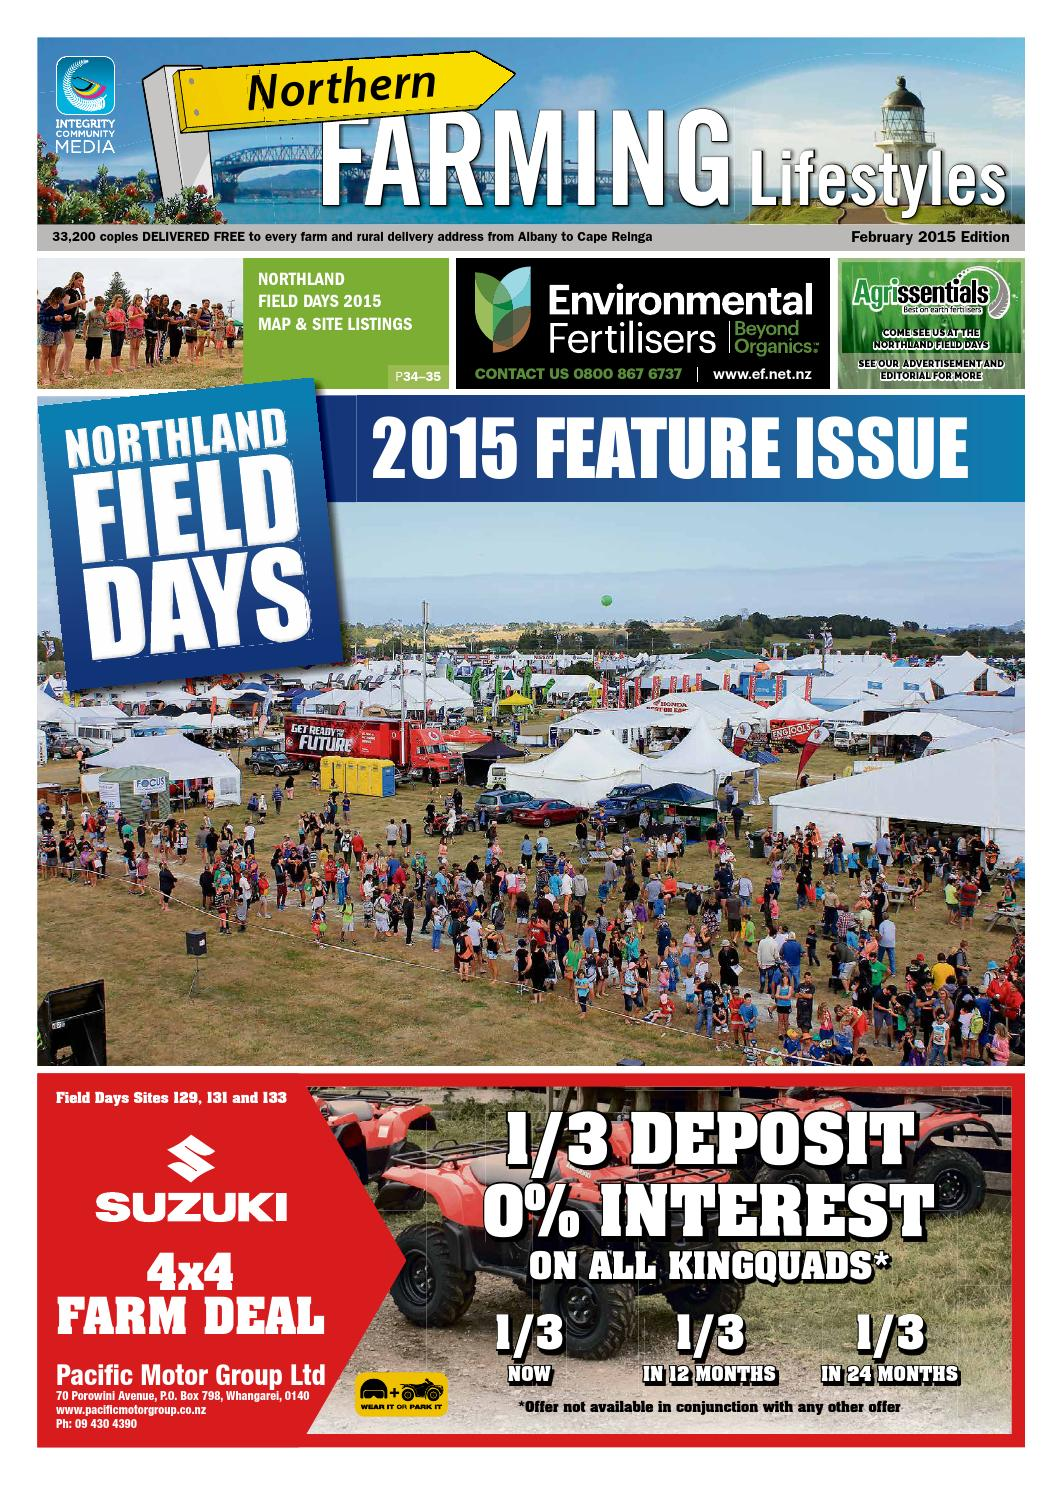 Northern Farming Lifestyles, February 2015 by Integrity Community Media -  issuu